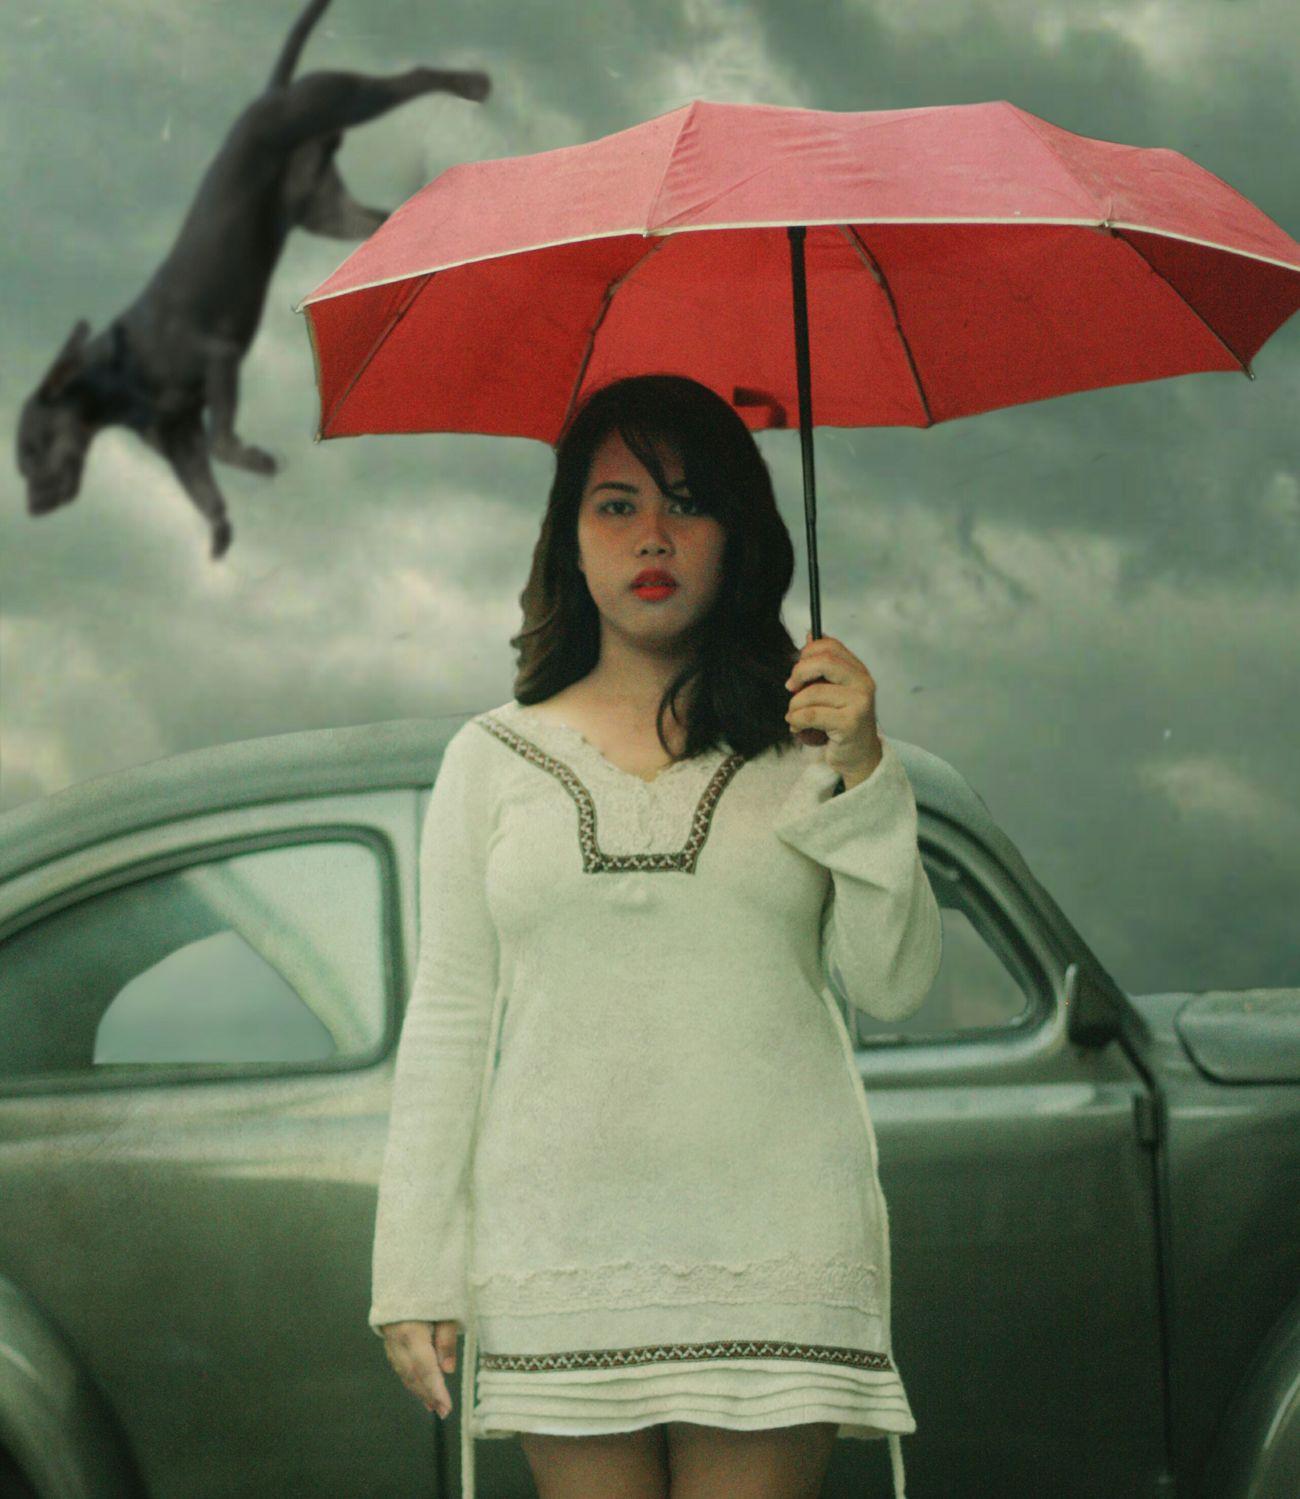 the fifth stage of grief Depression Movingon MoveOn Mentalillness Mentalhealth  Depressive Shield Umbrella Red Umbrella Redumbrella Standing BYOPaper! The Portraitist - 2017 EyeEm Awards Surrealist Art Conceptual Photography  Depression